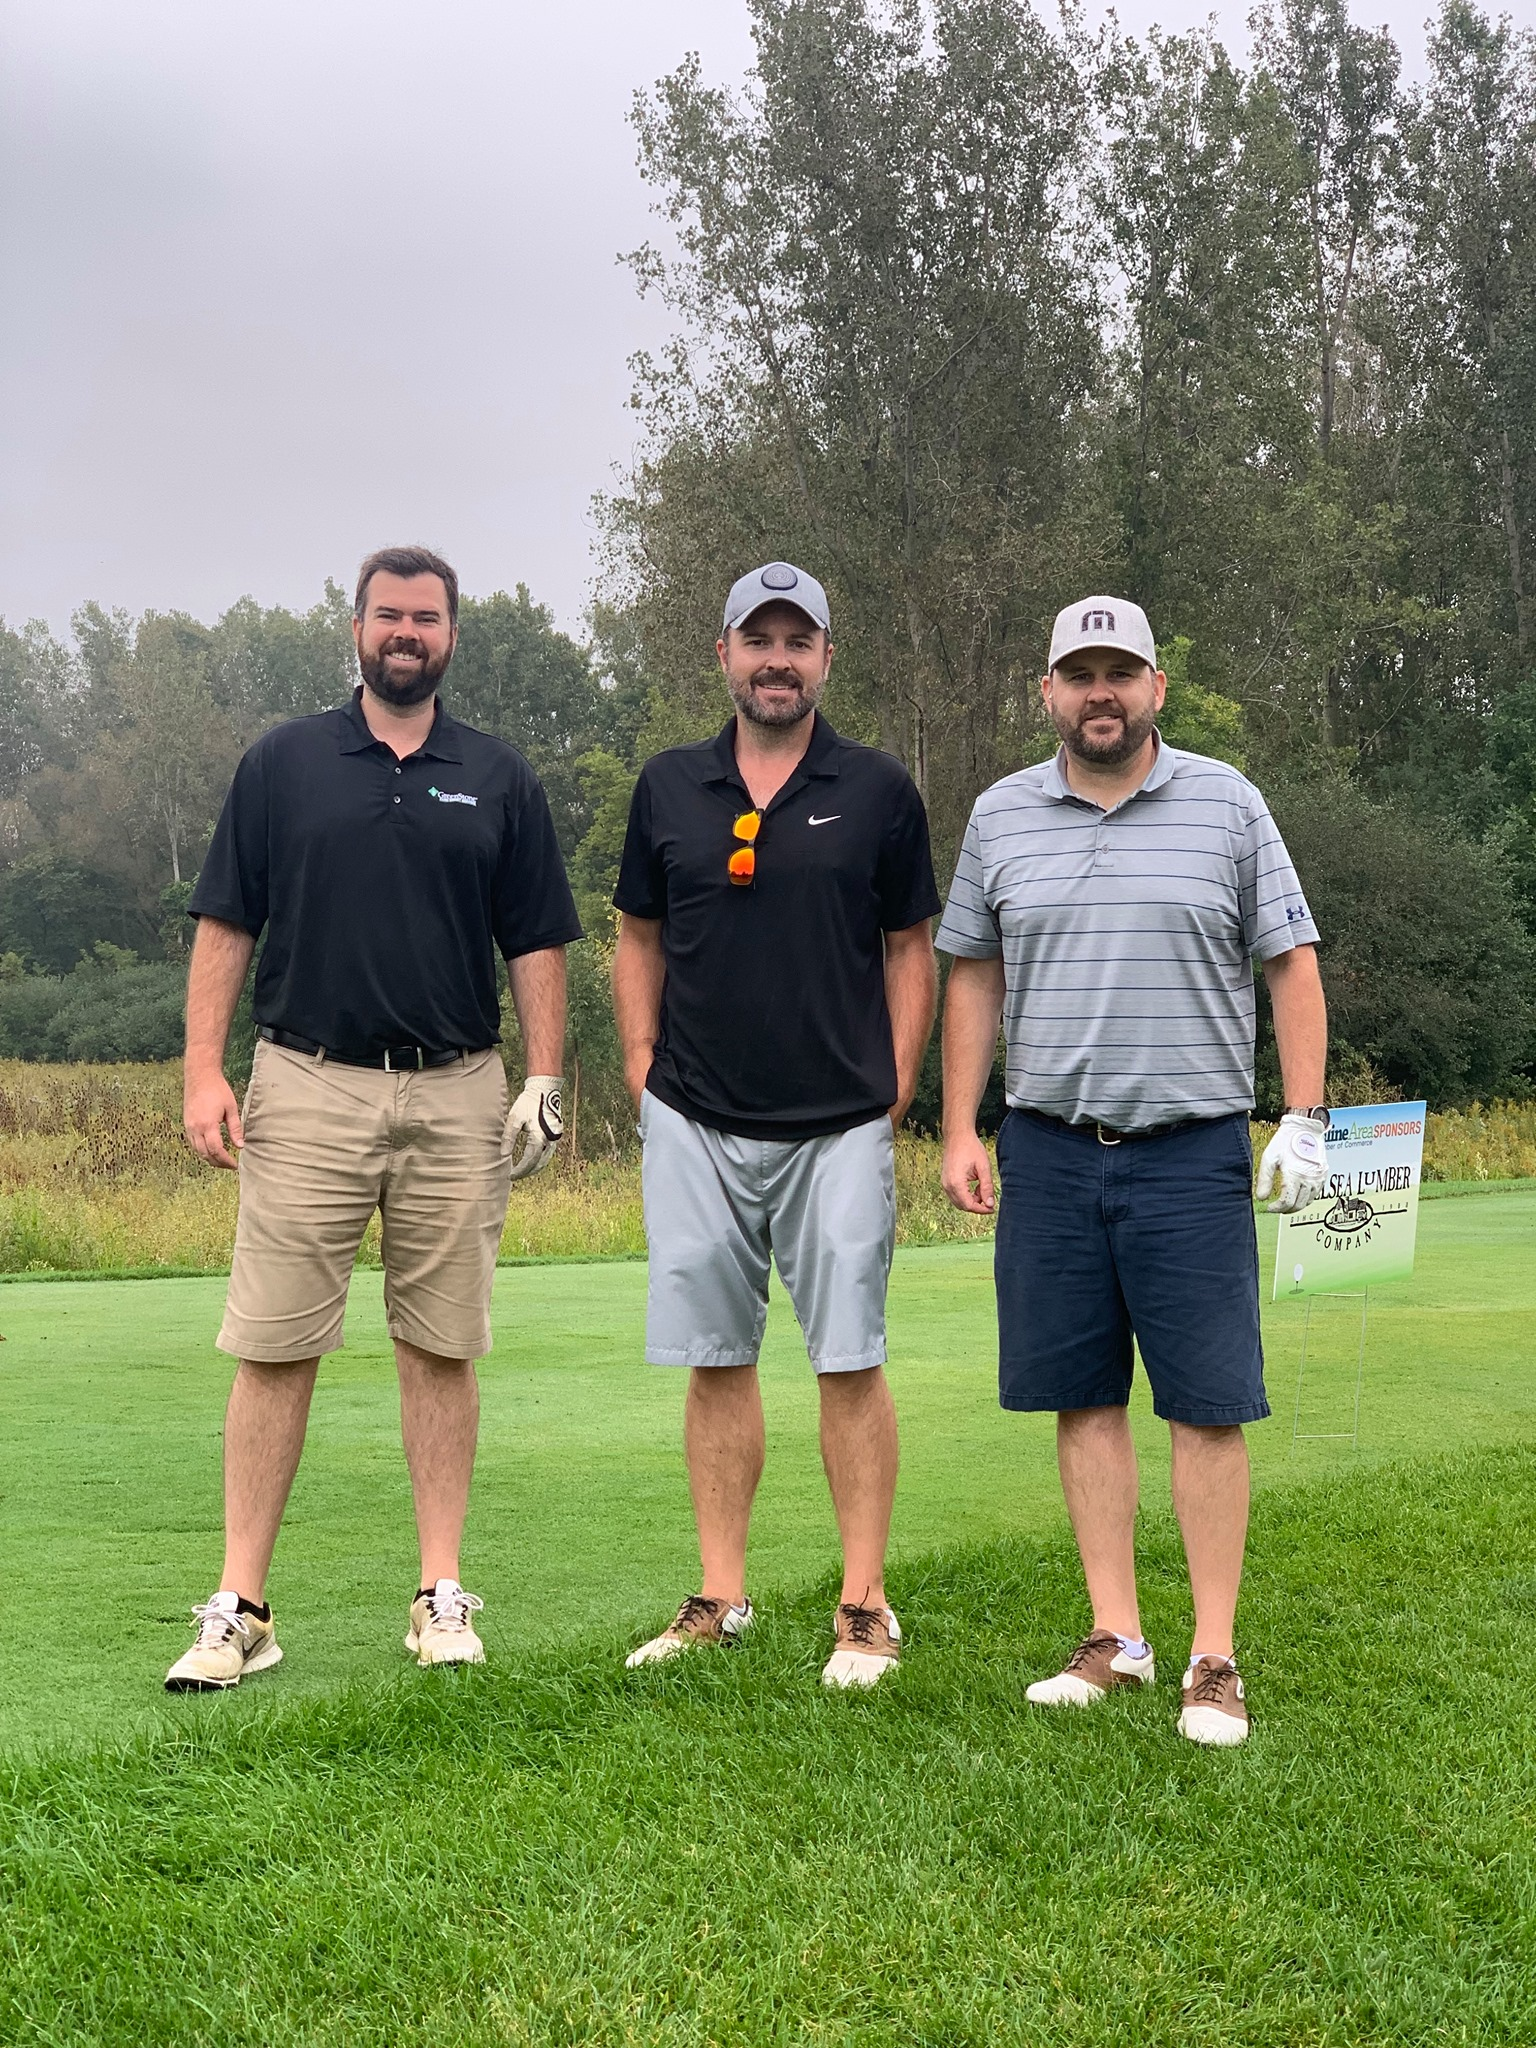 SACC-Golf-Outing-2021-Greenstone.jpg